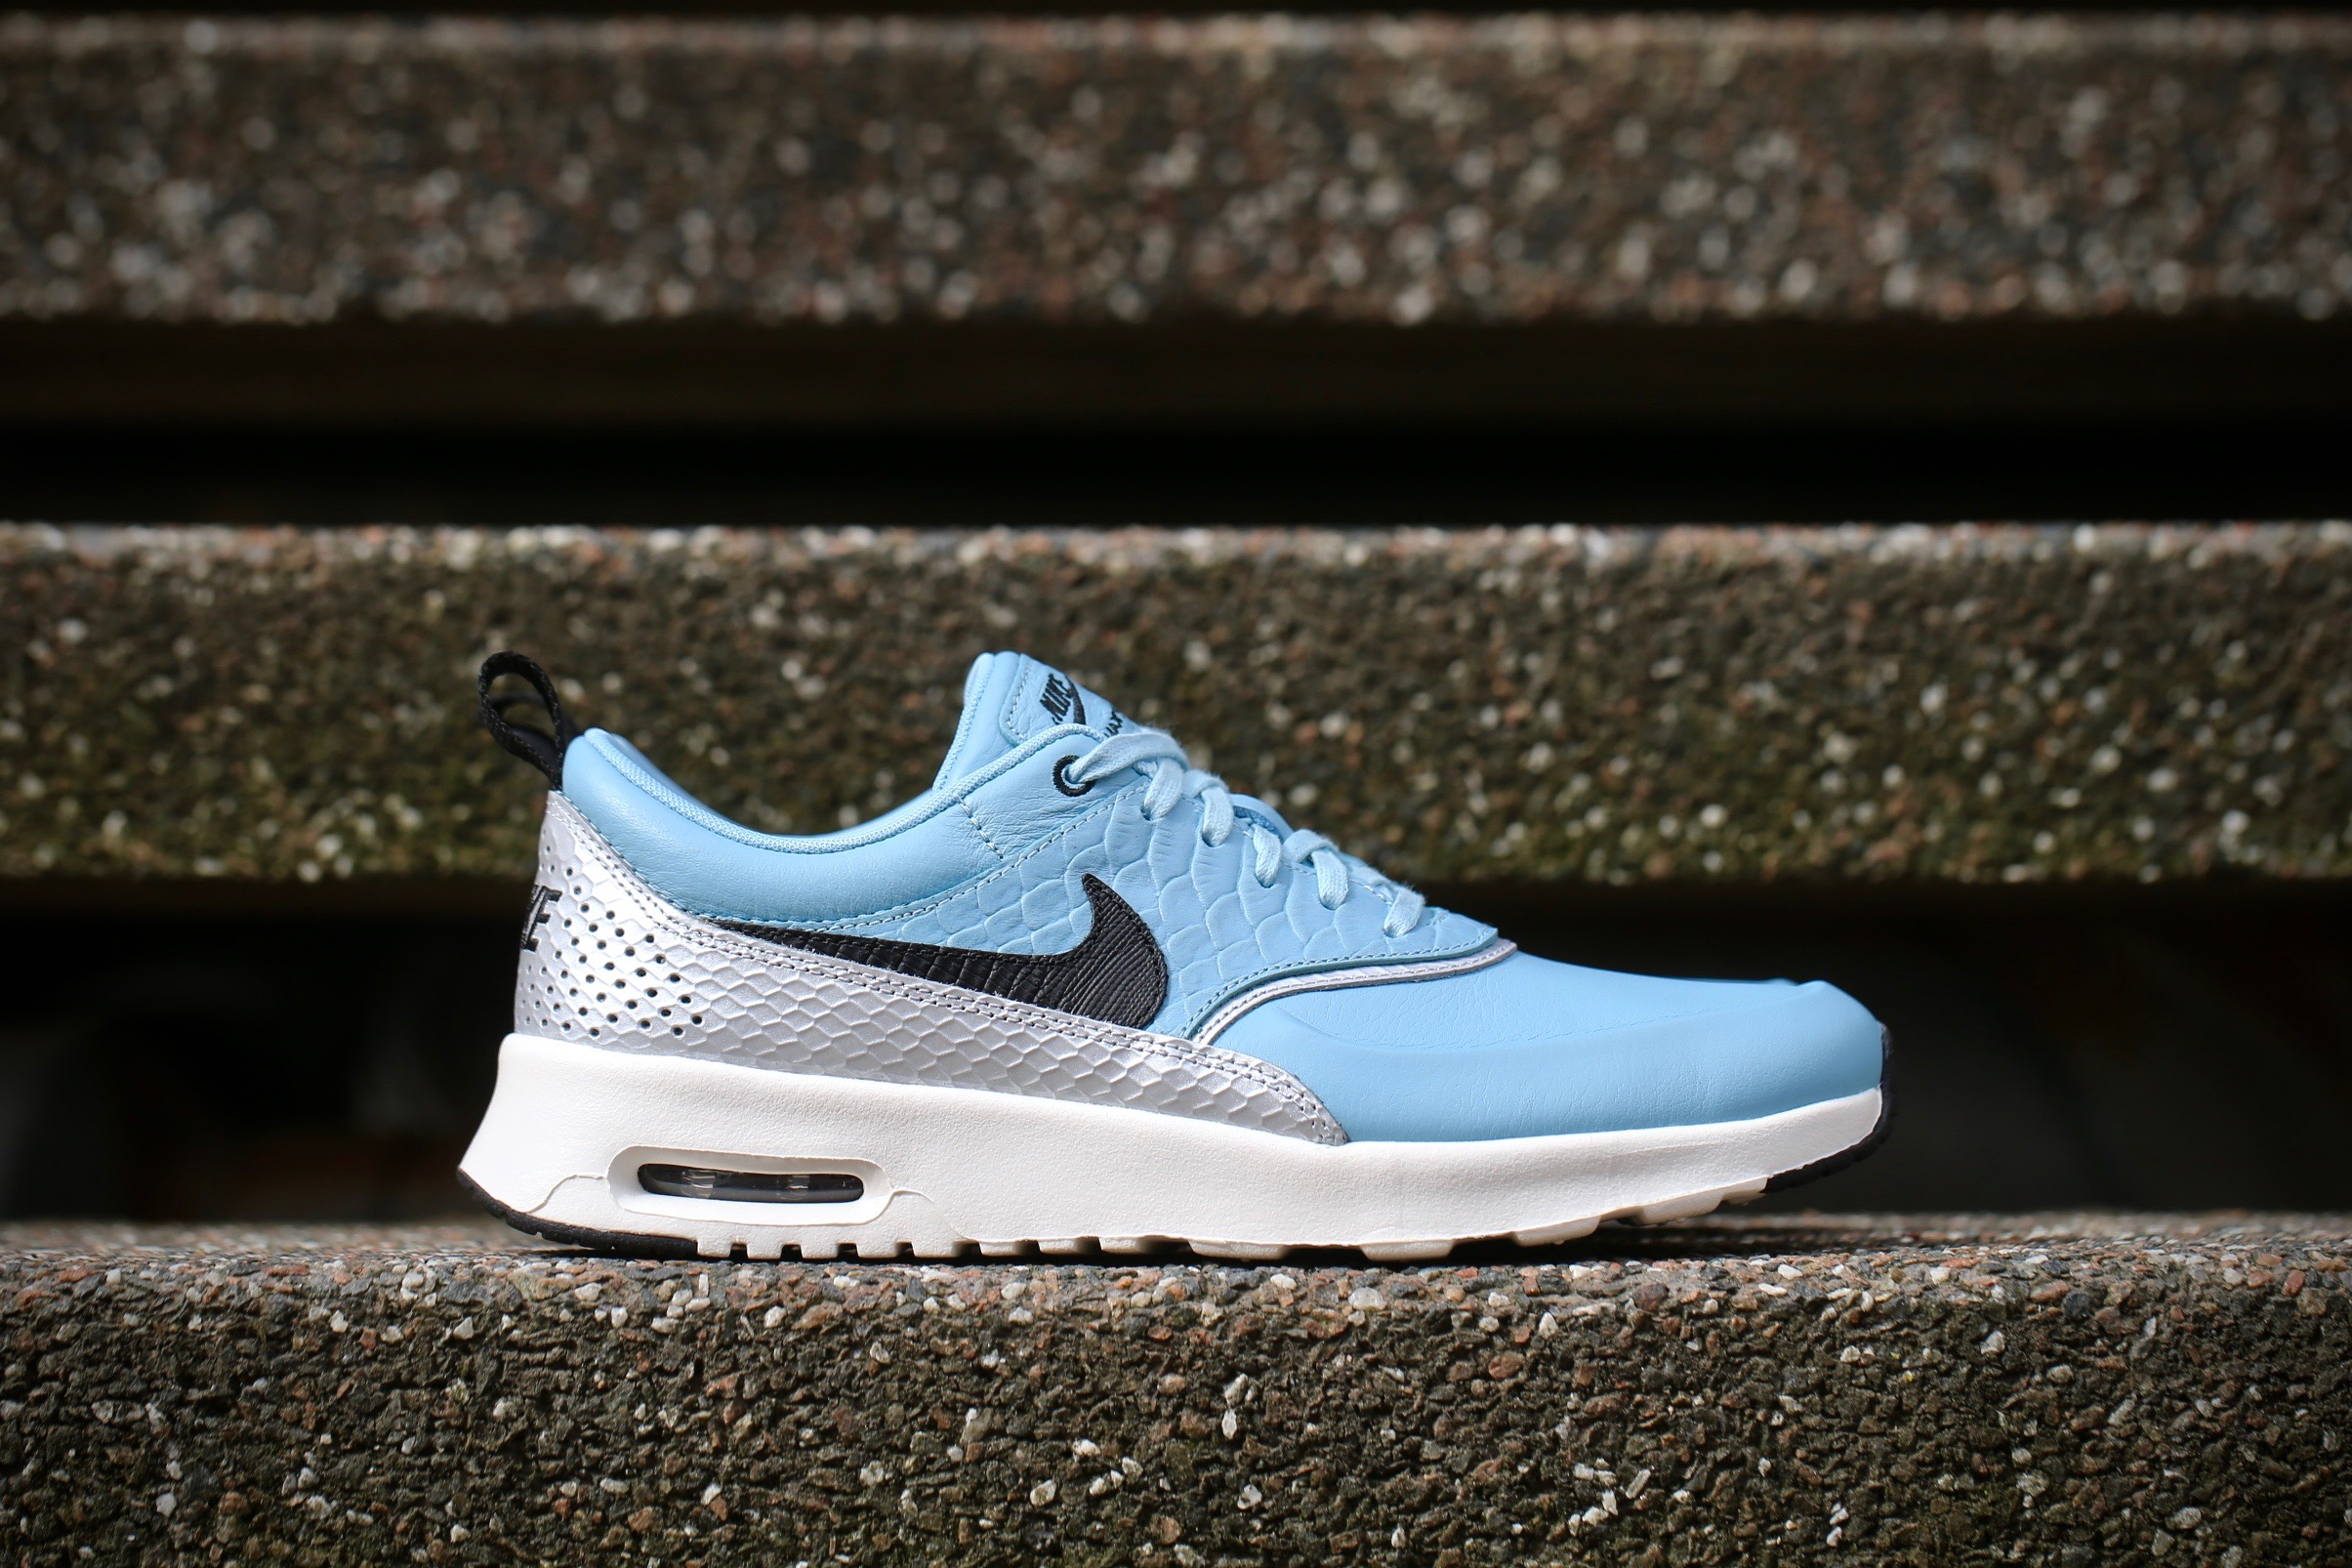 48a274ee9e07 Nike Wmns Air Max Thea LX – Mica Blue   Metallic Silver   Ivory ...